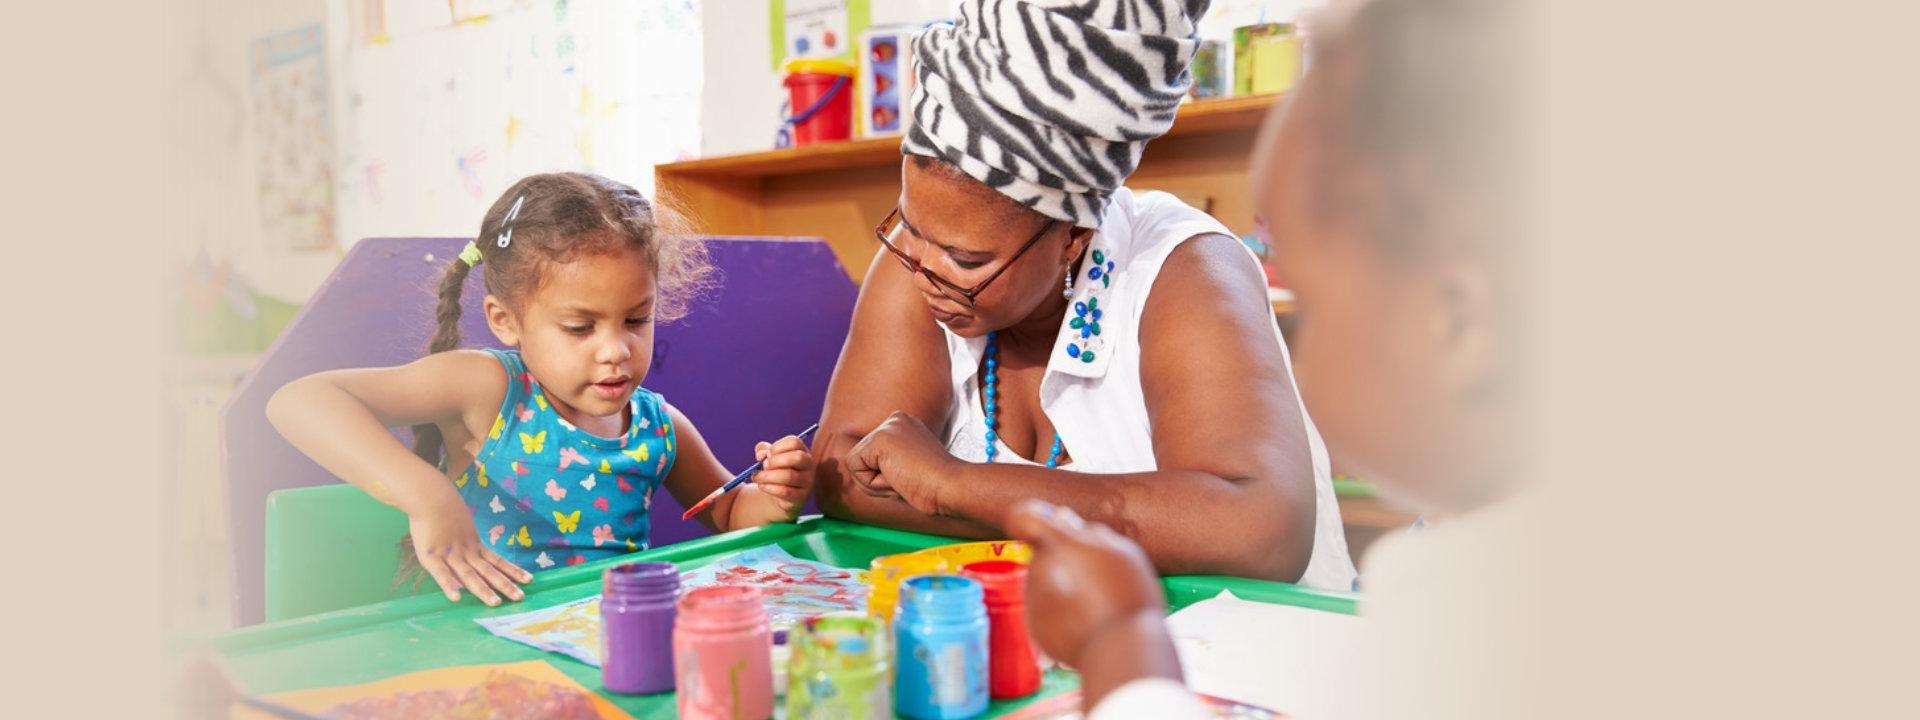 lady teaching little girl